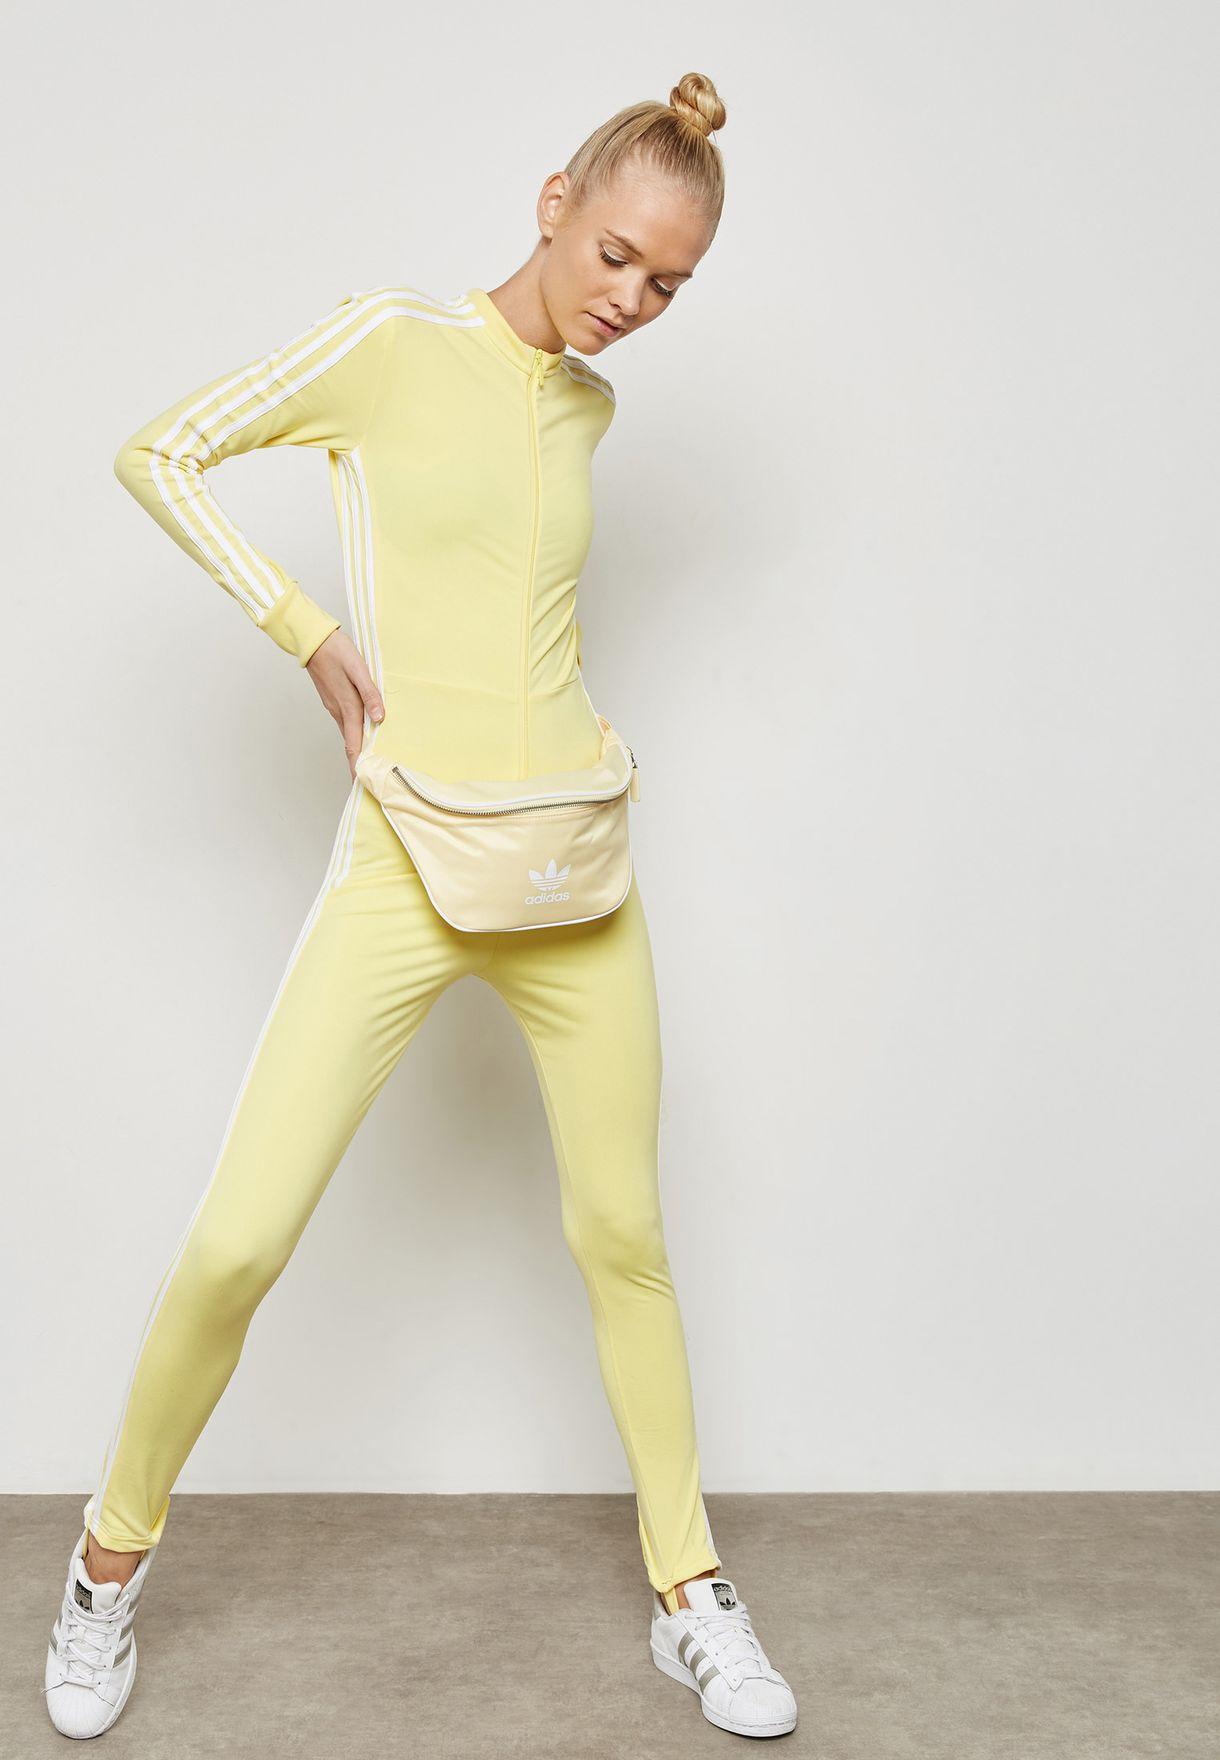 f004d01bca2b Shop adidas Originals yellow adicolor Stage Jumpsuit CE4956 for ...